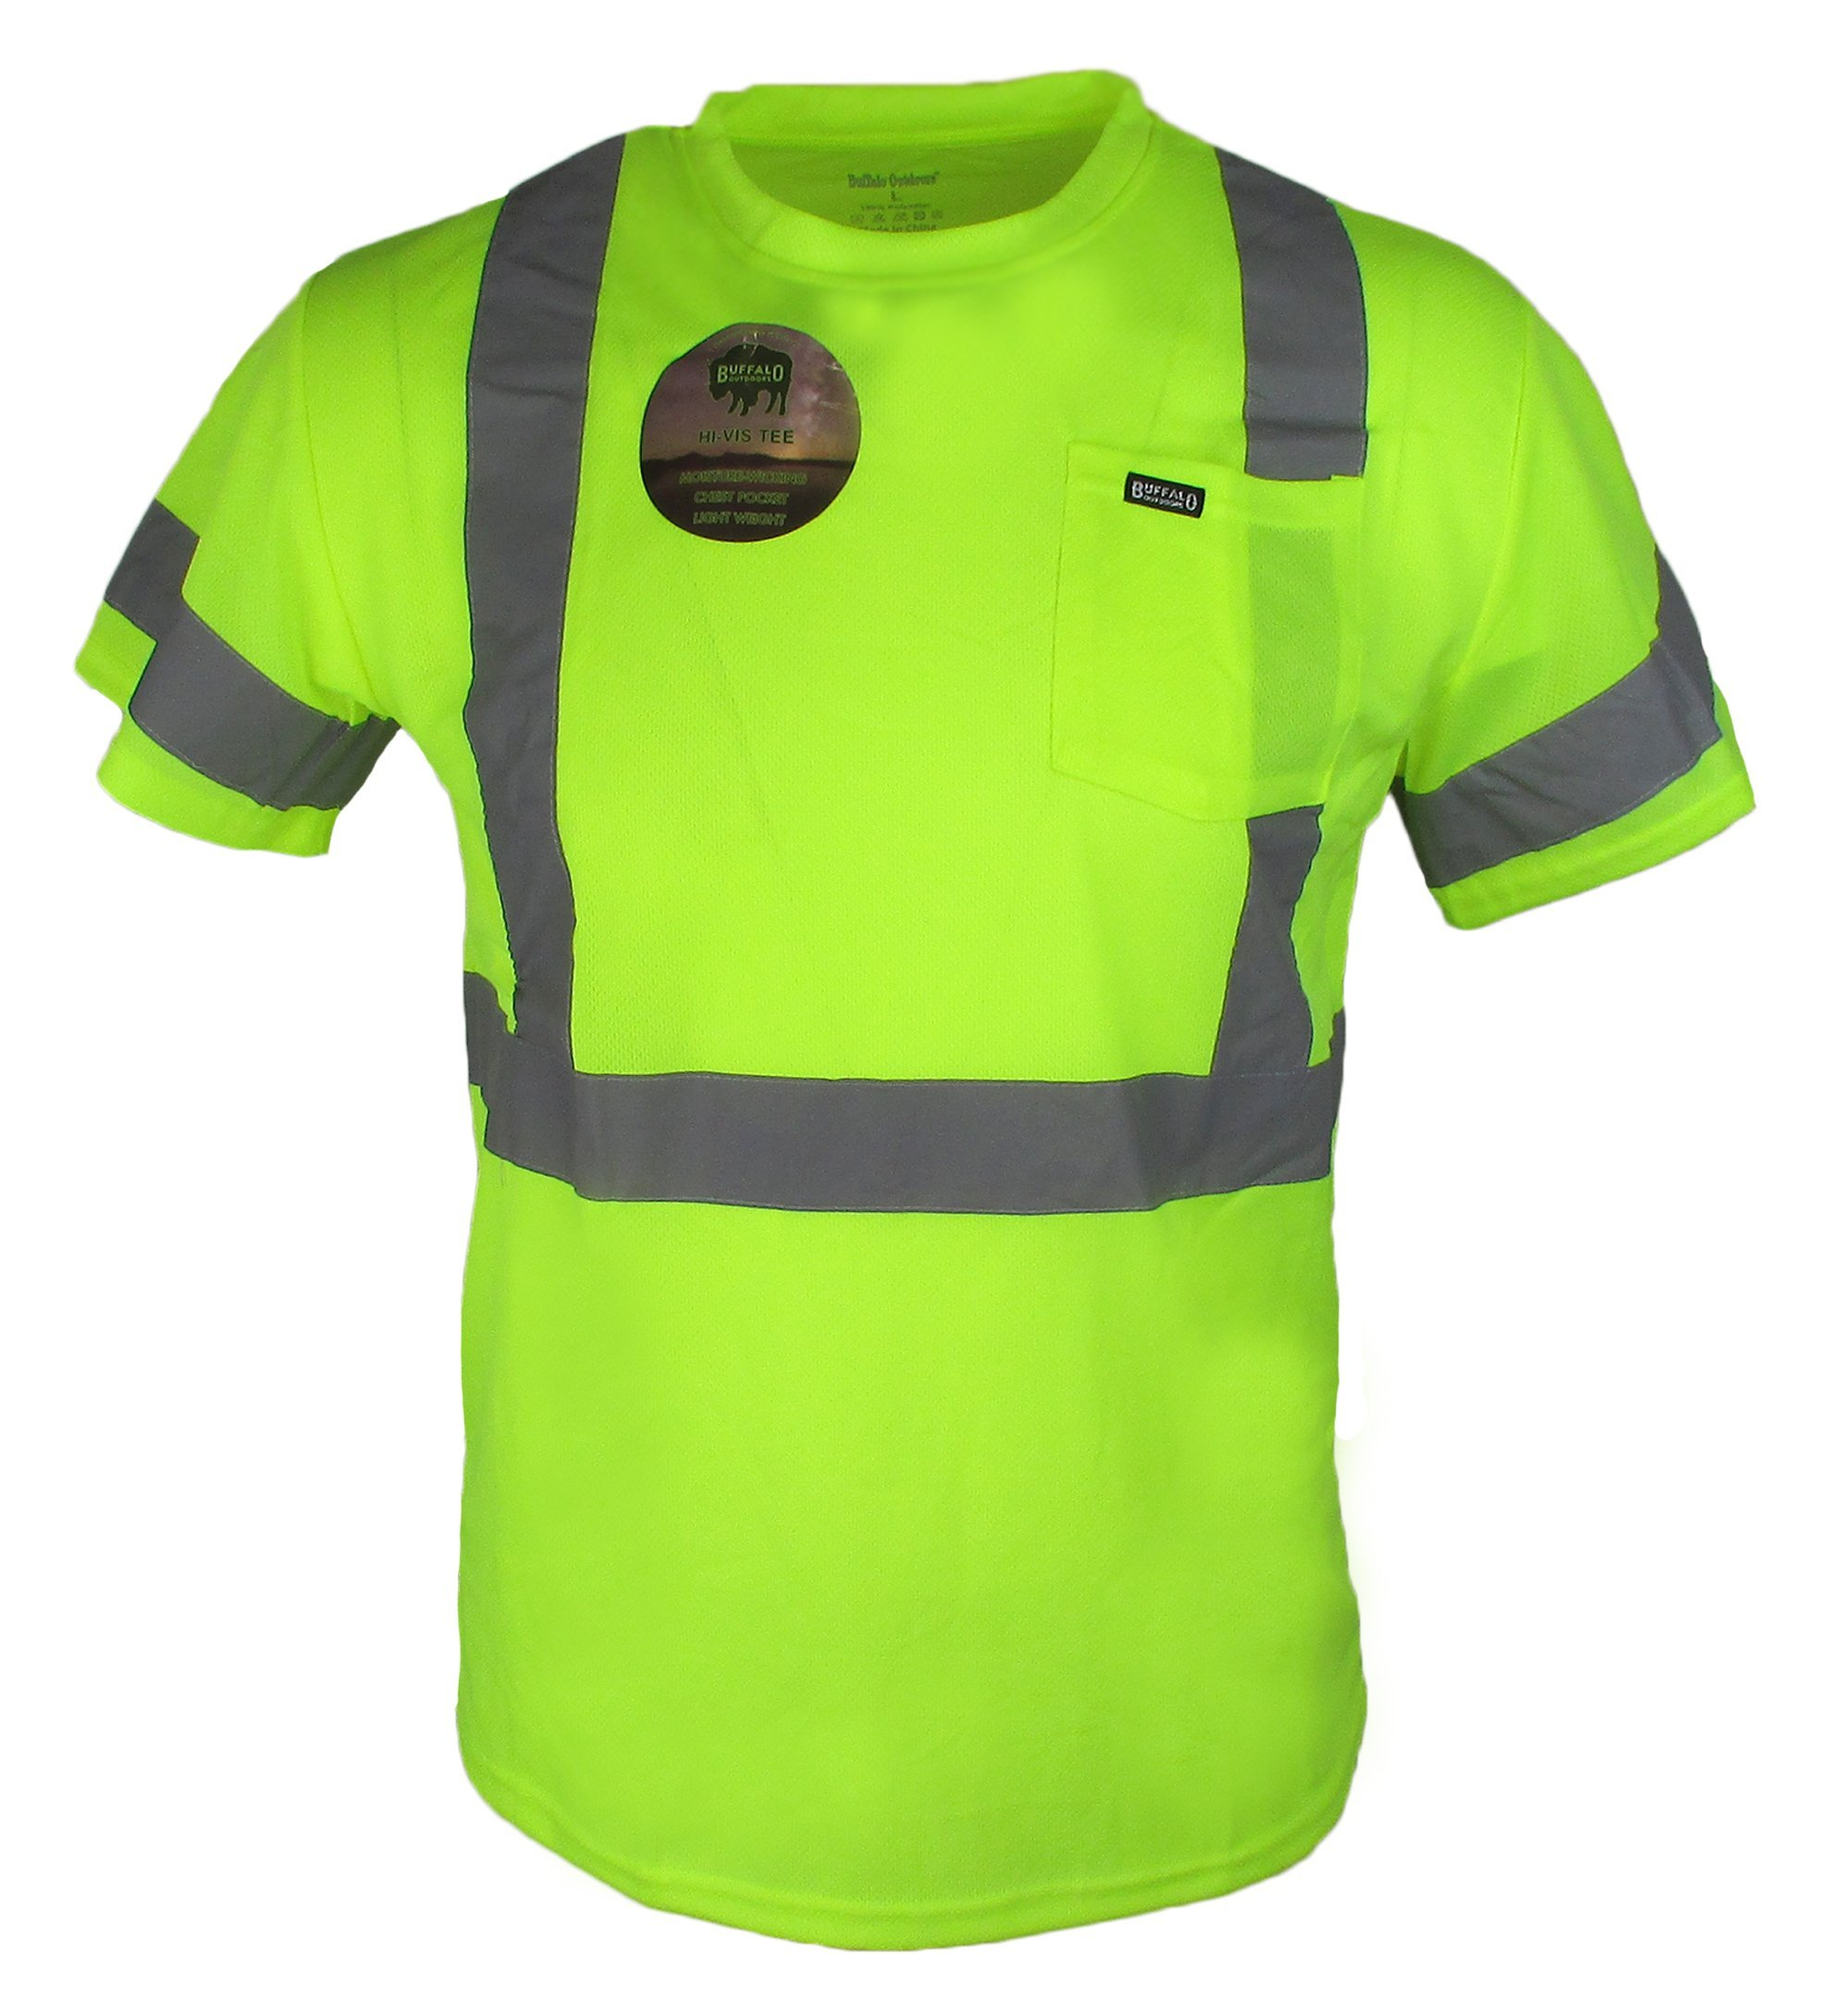 Buffalo Outdoors Men's Hi Vis Reflective Safety Pocket T Shirt High Visibility , 3XL